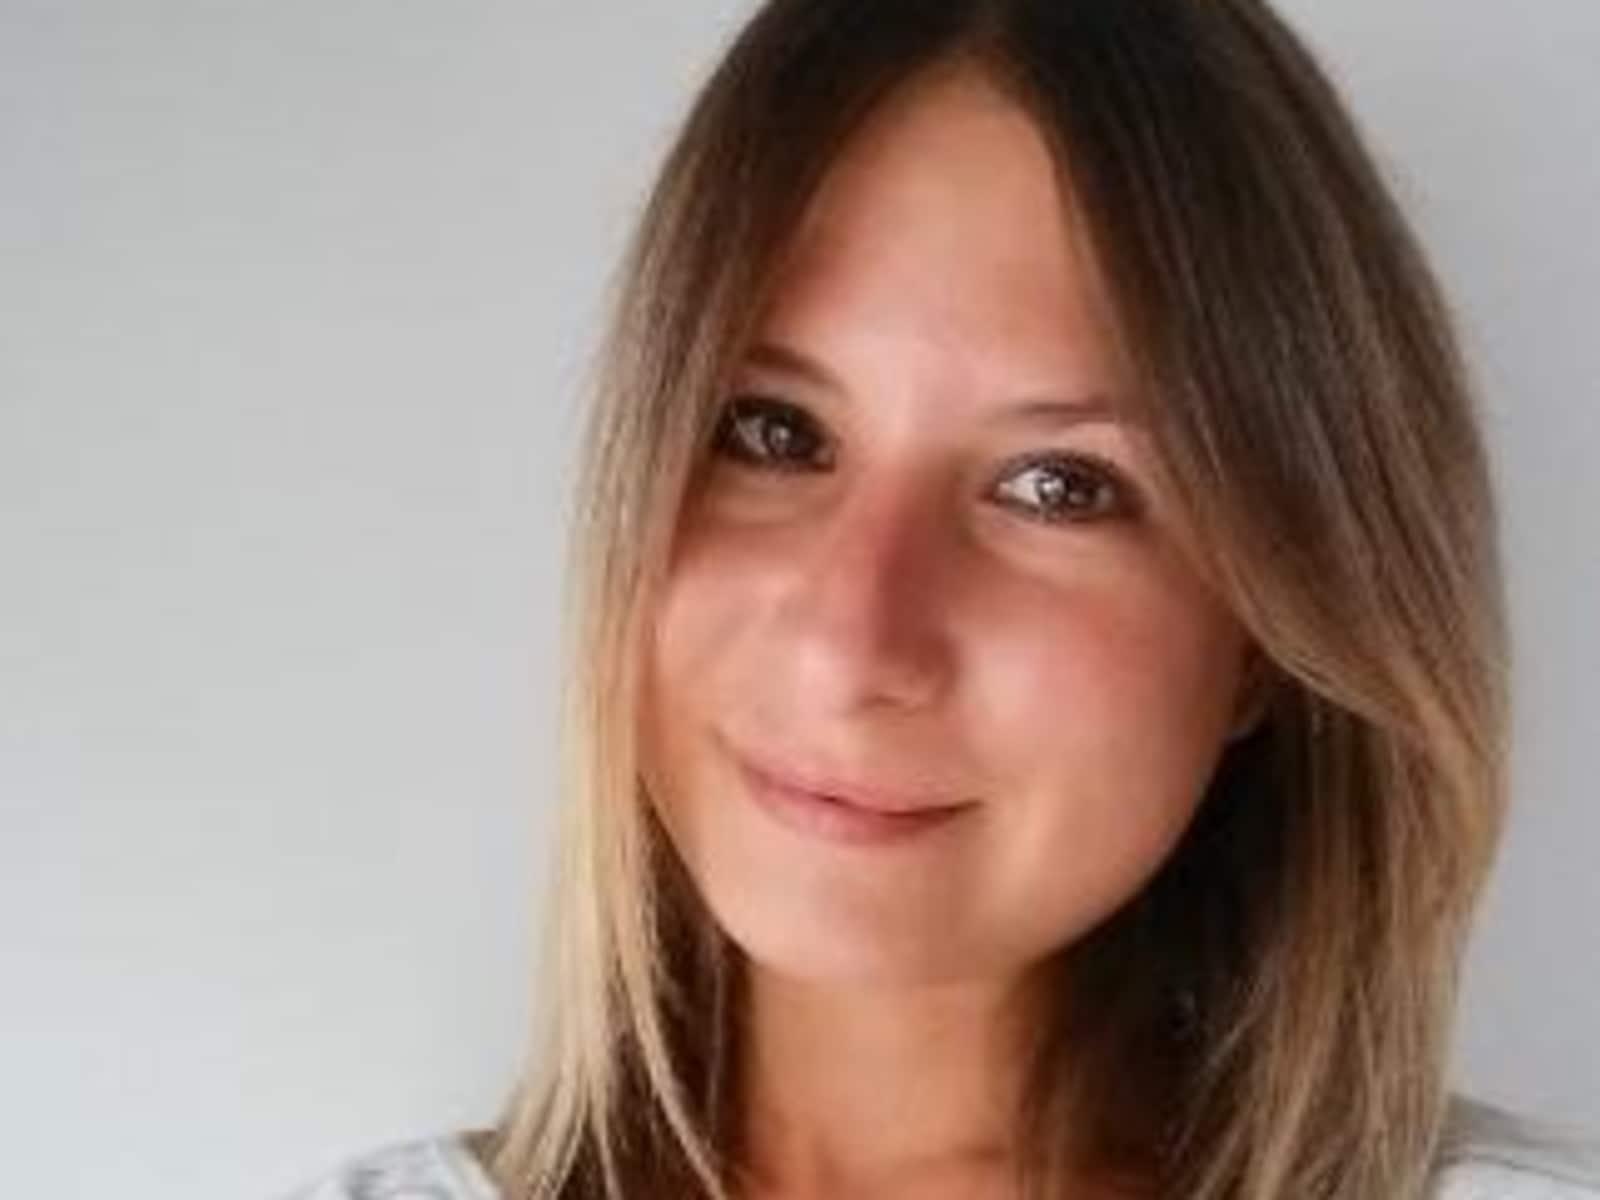 Laura from London, United Kingdom